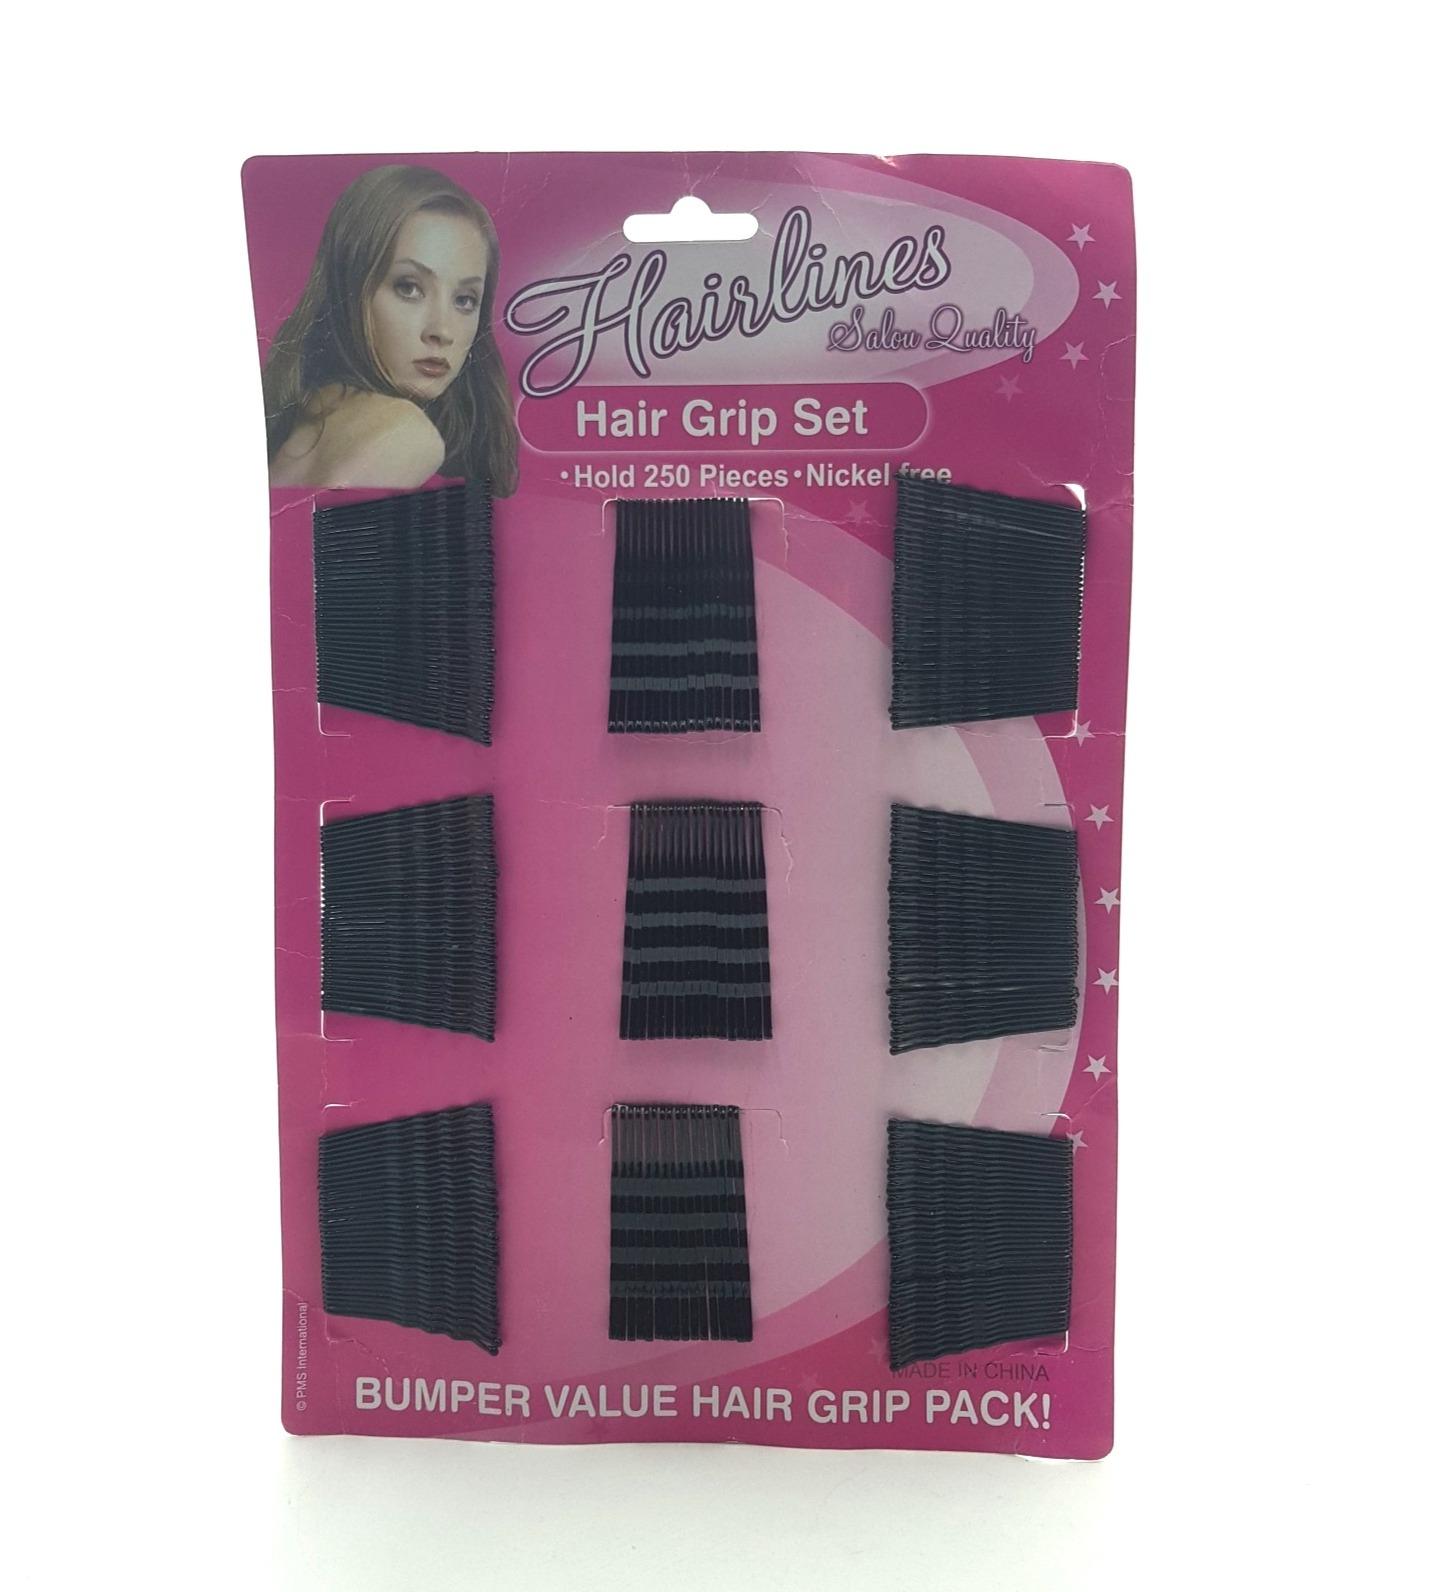 250 Pcs Bumper Value Hair Grip Pack